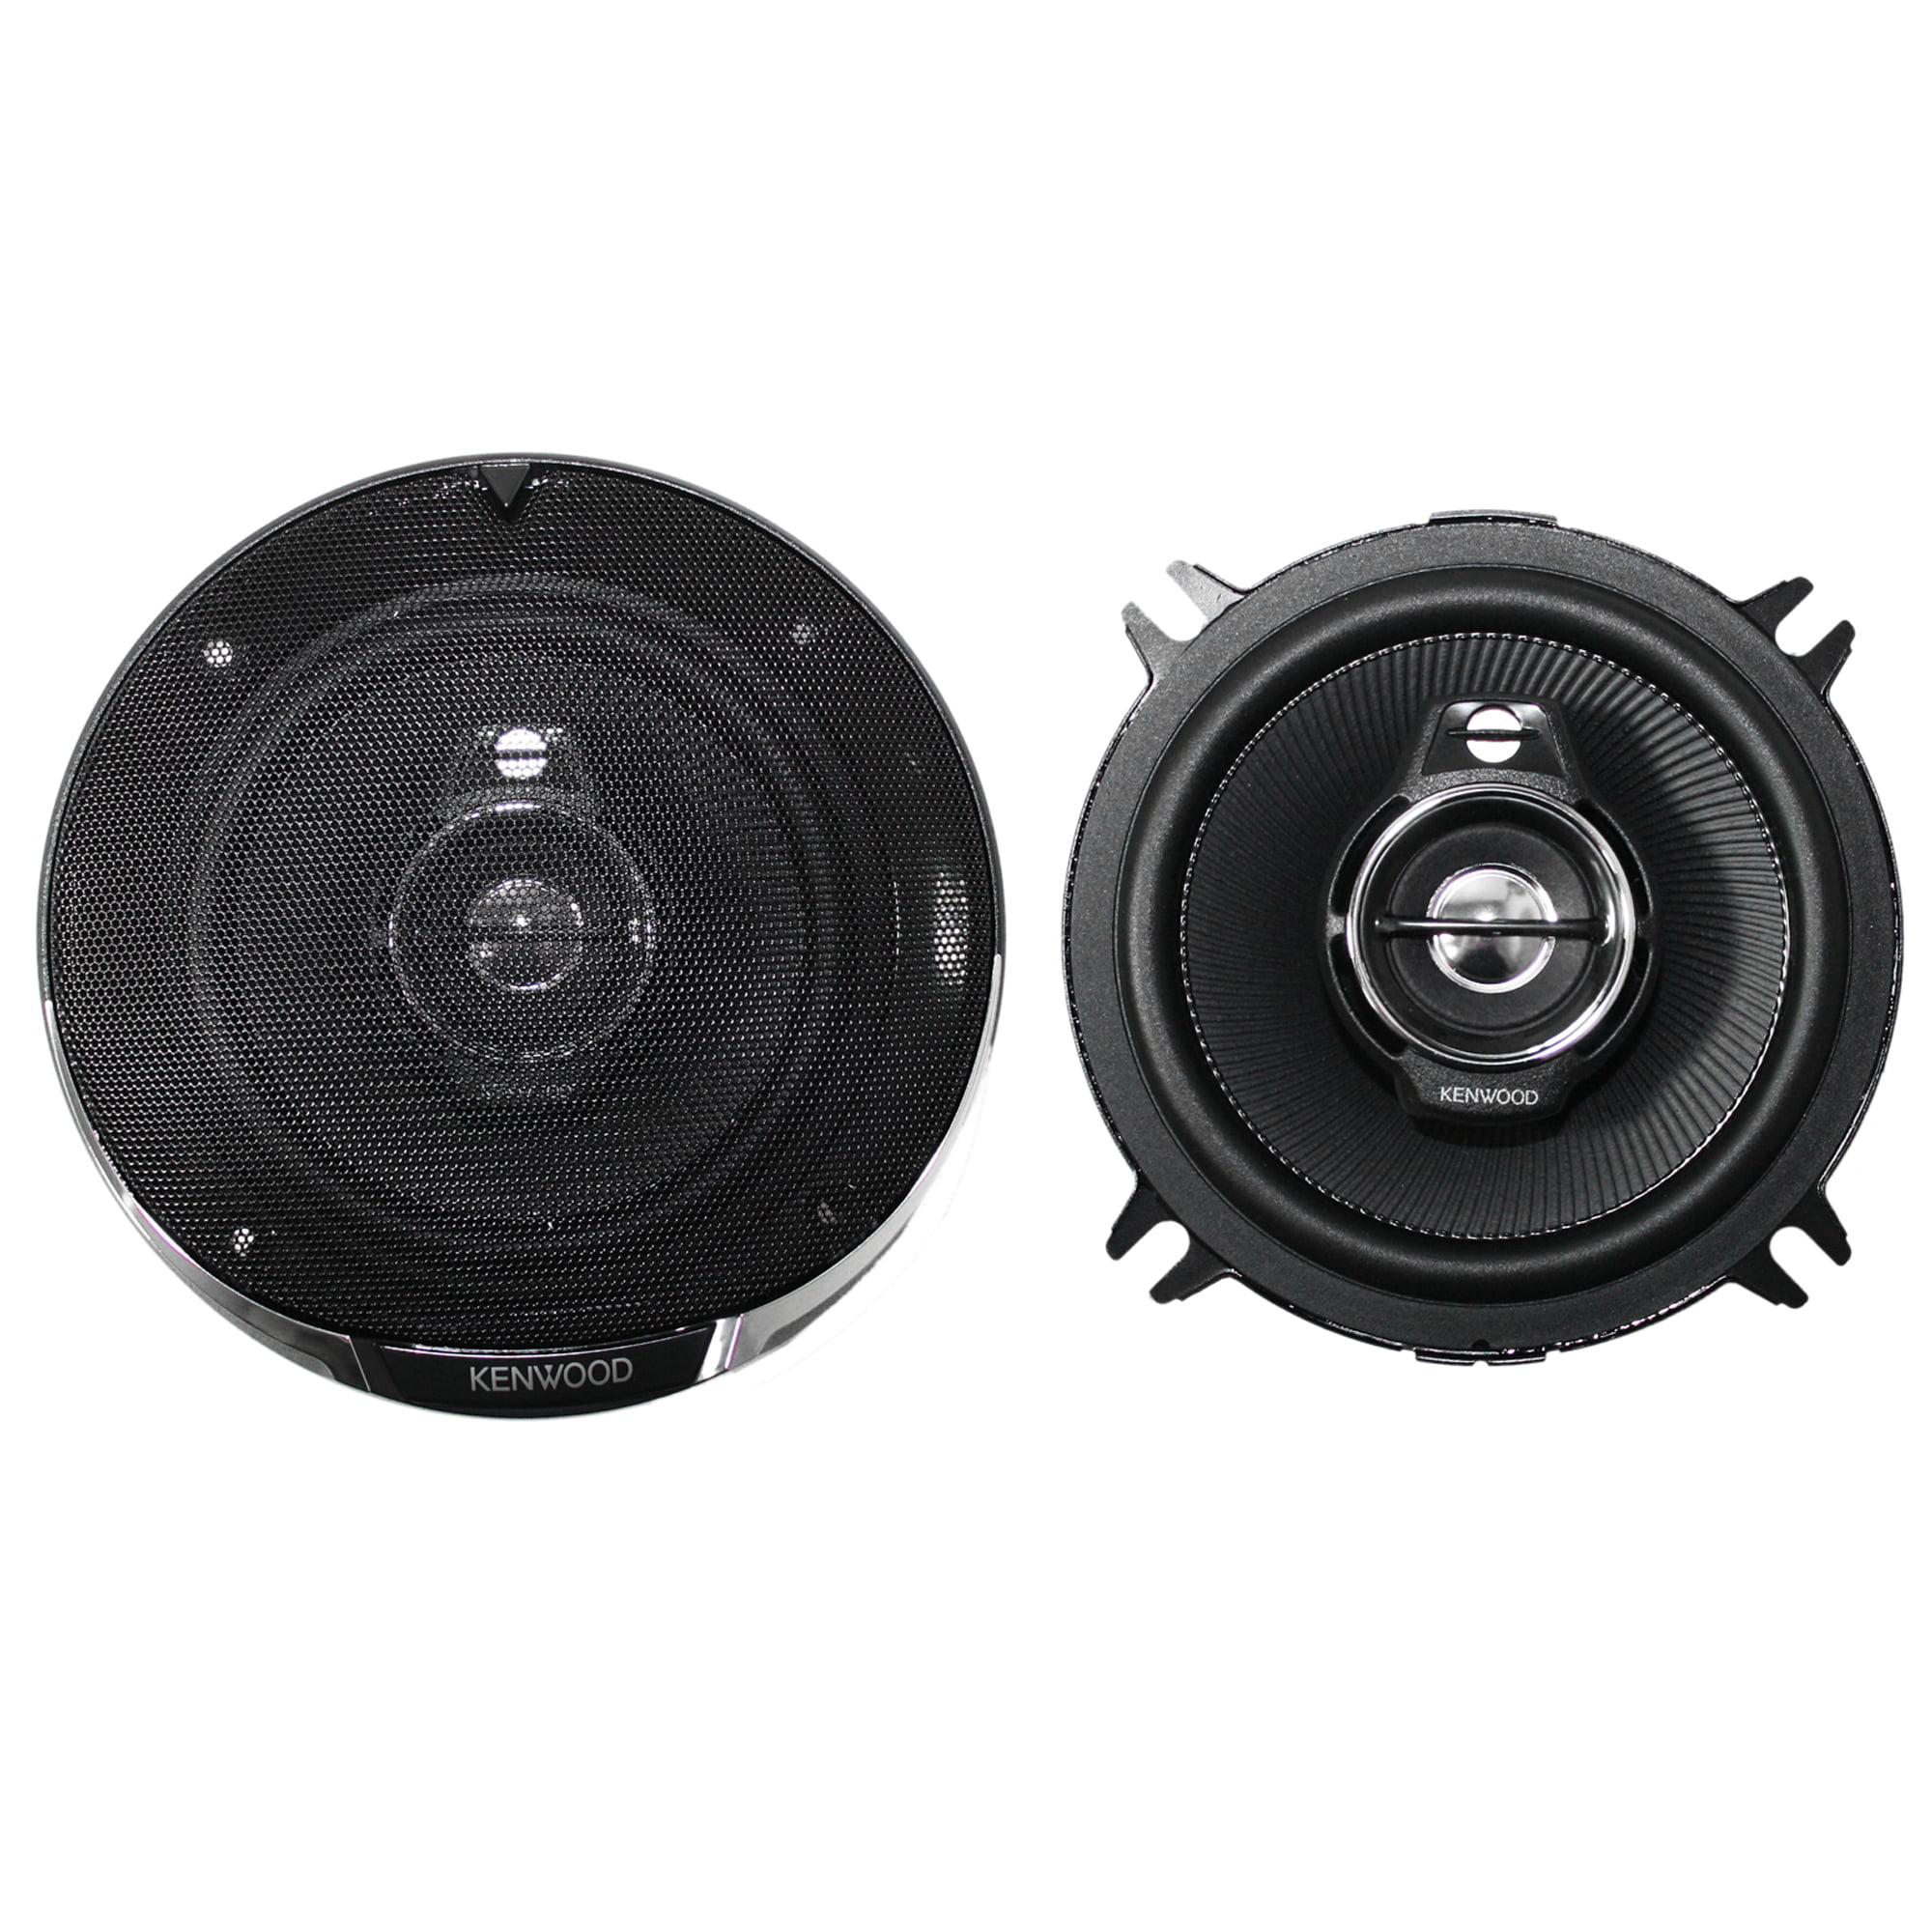 "Kenwood Pair of KFC-1395PS 5.25"" 320W 3-Way Car Audio Coaxial Speakers Stereo"